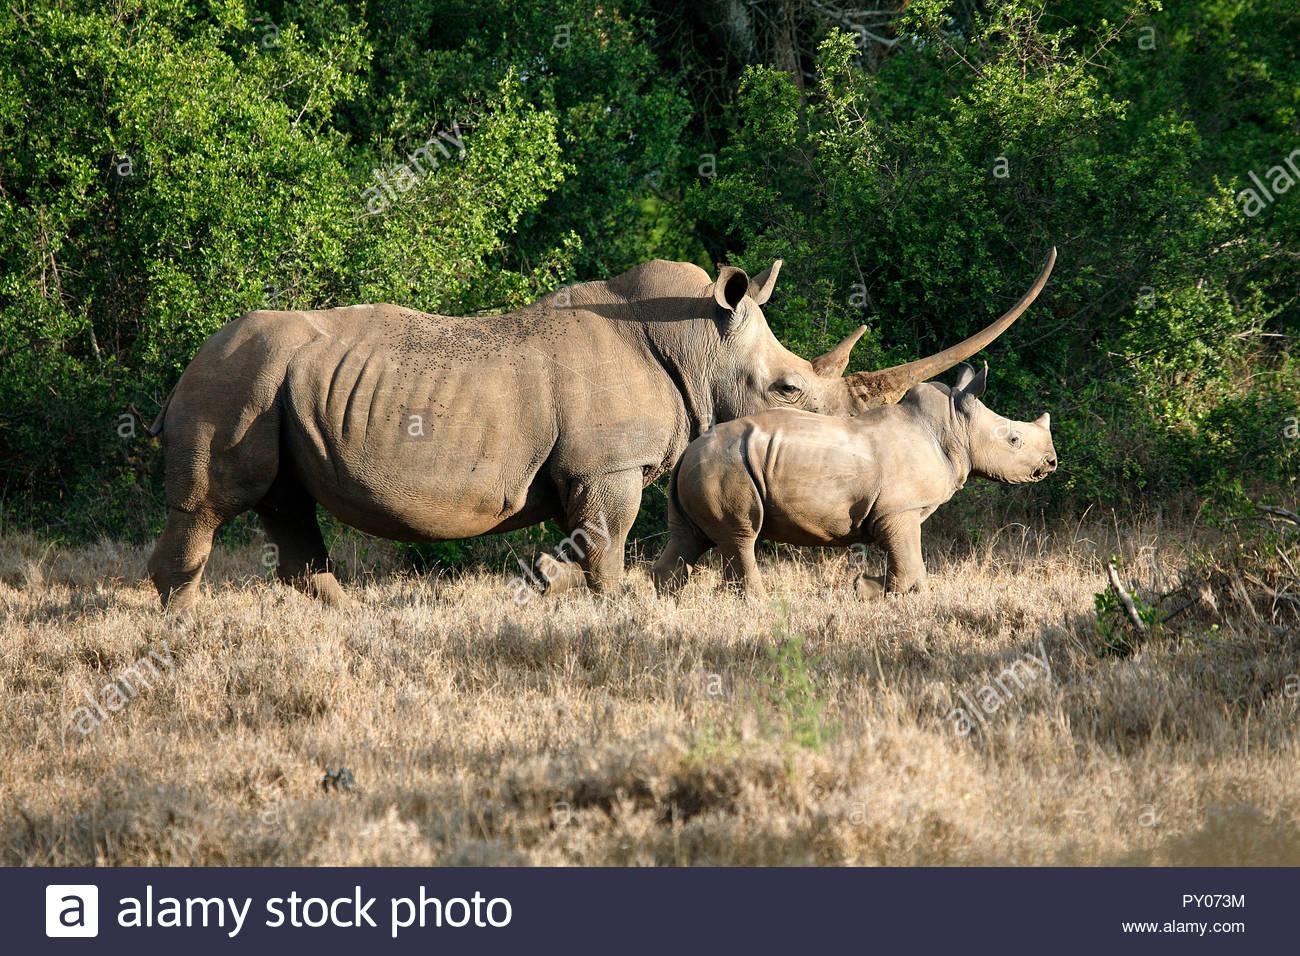 Breitmaulnashorn (Ceratotherium simum) mit Kalb, Kenia, Afrika | White rhinoceros (Ceratotherium simum) with calf, Kenya, Africa - Stock Image